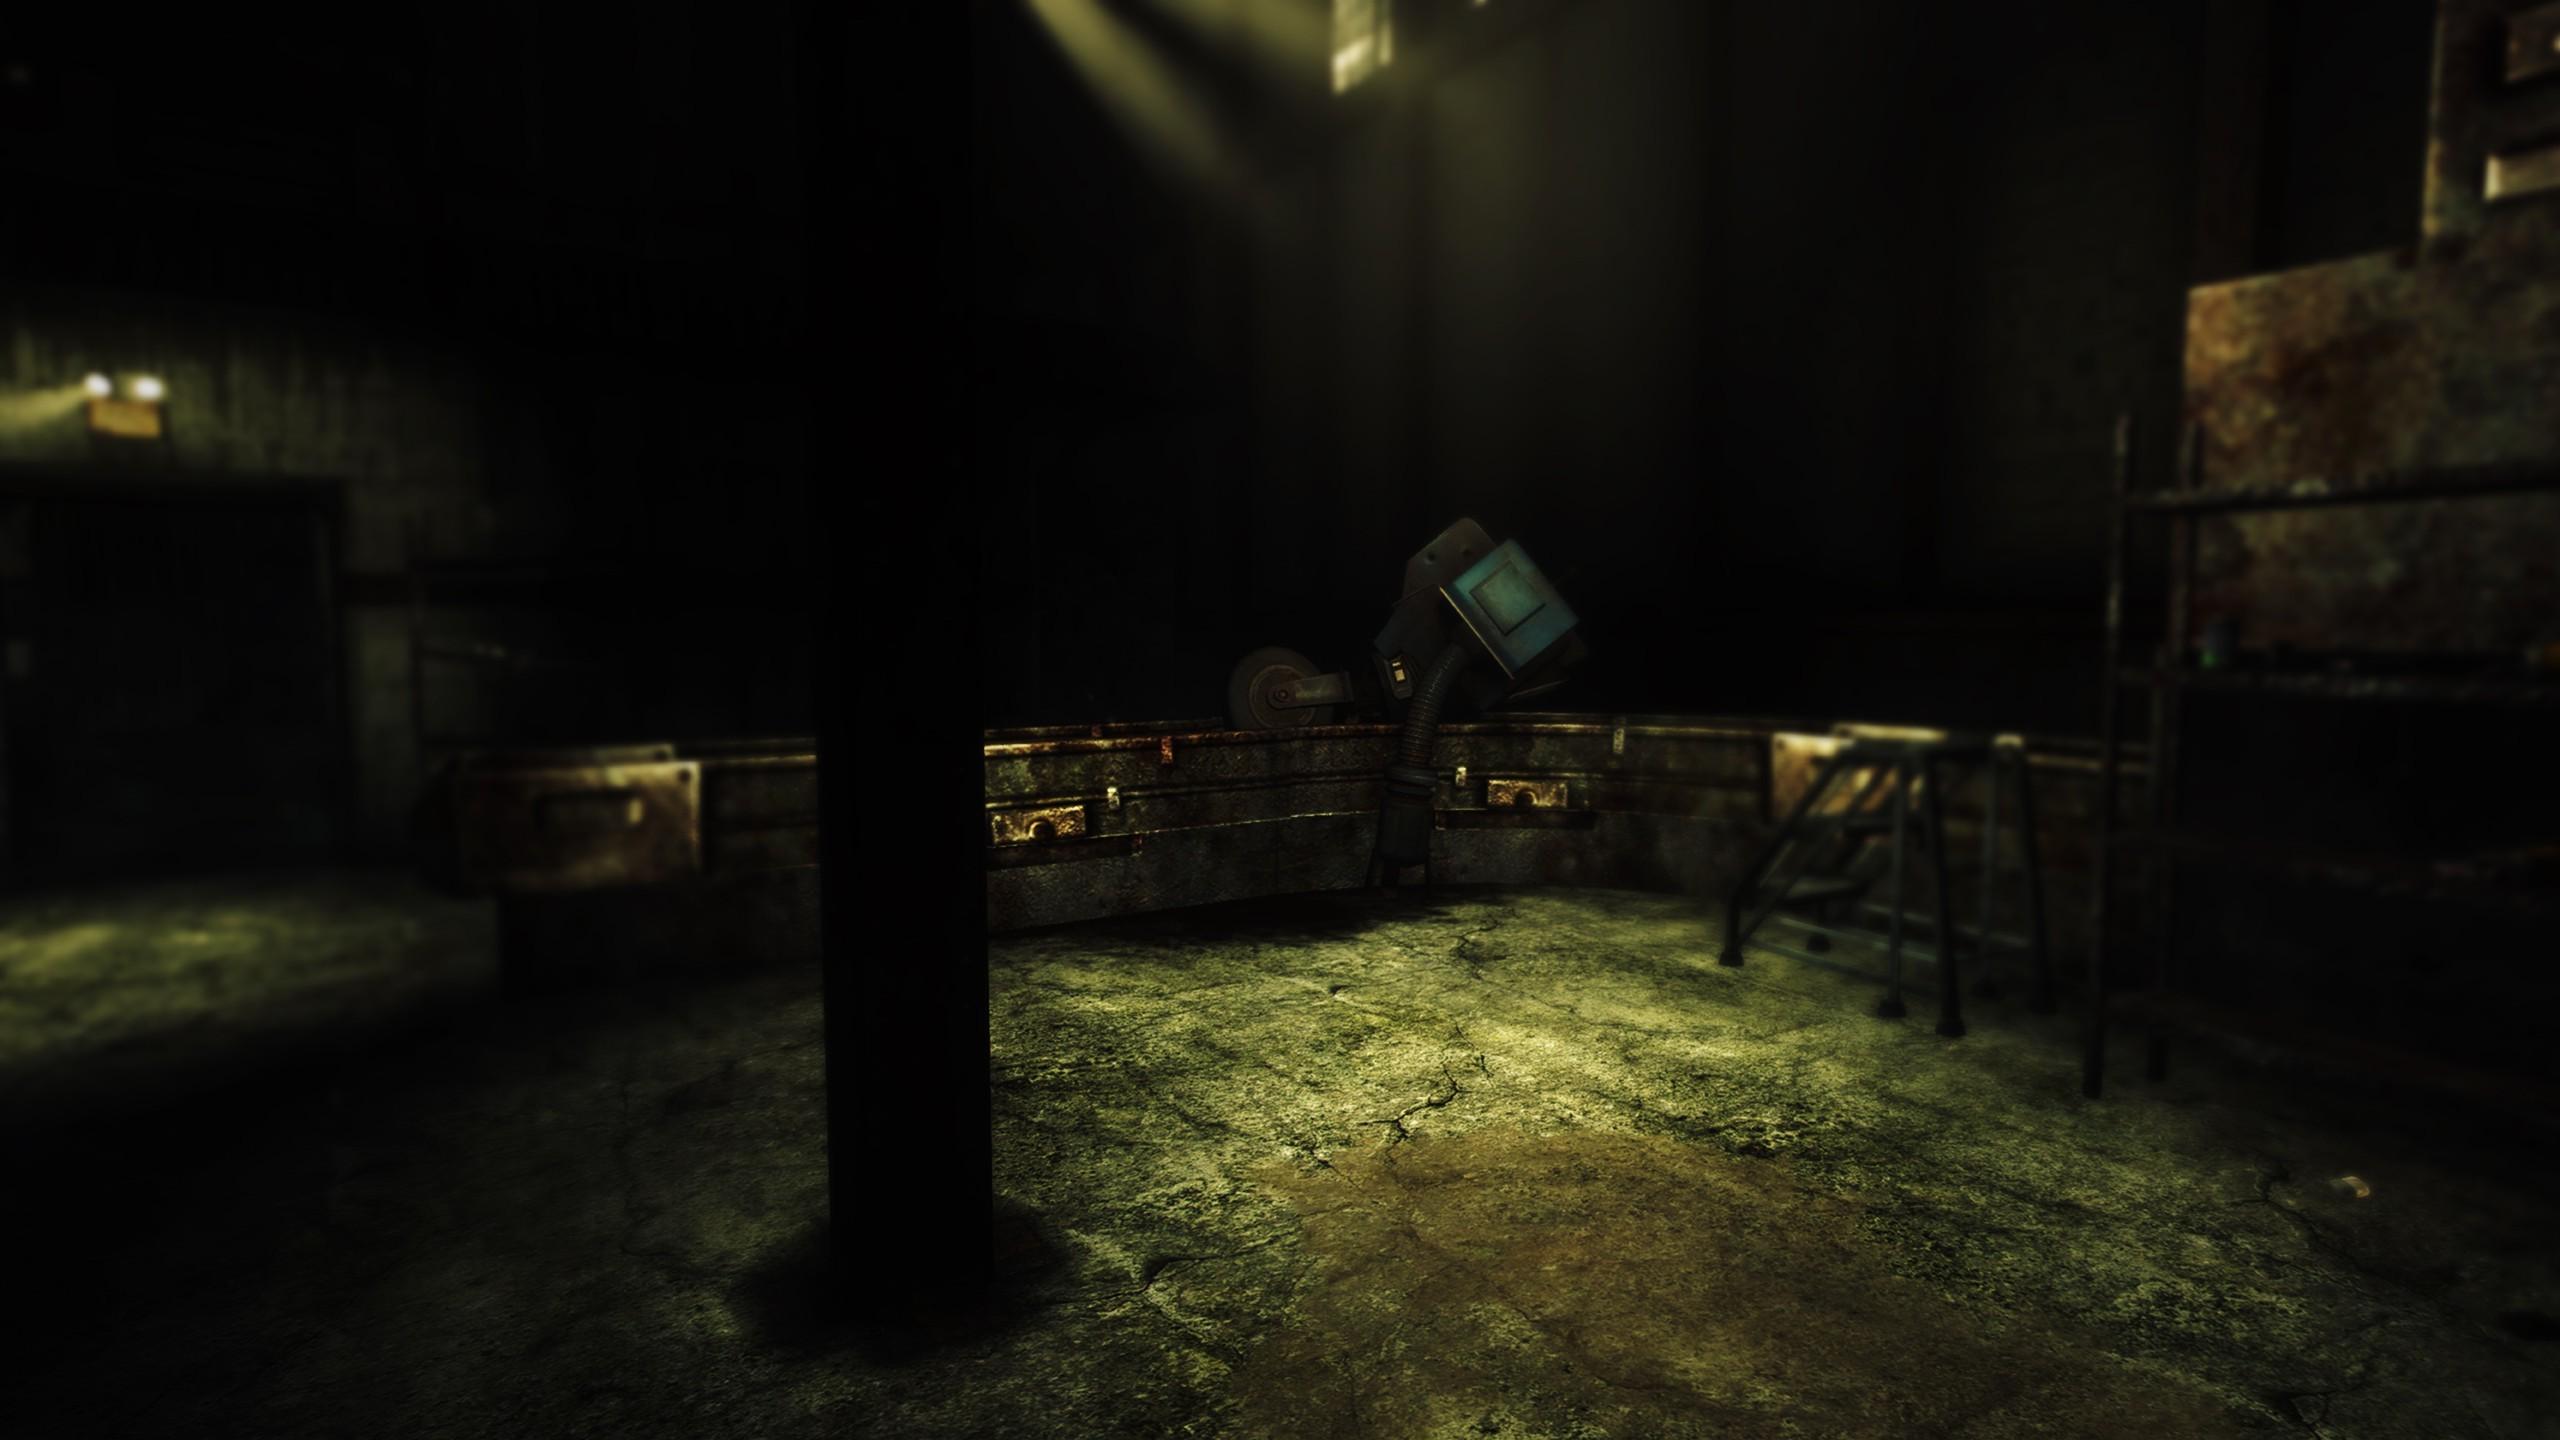 Fallout, Fallout: New Vegas, Fallout 3, Screenshots, Environment, Dark,  Video Games, ENB, 1440 Wallpapers HD / Desktop and Mobile Backgrounds